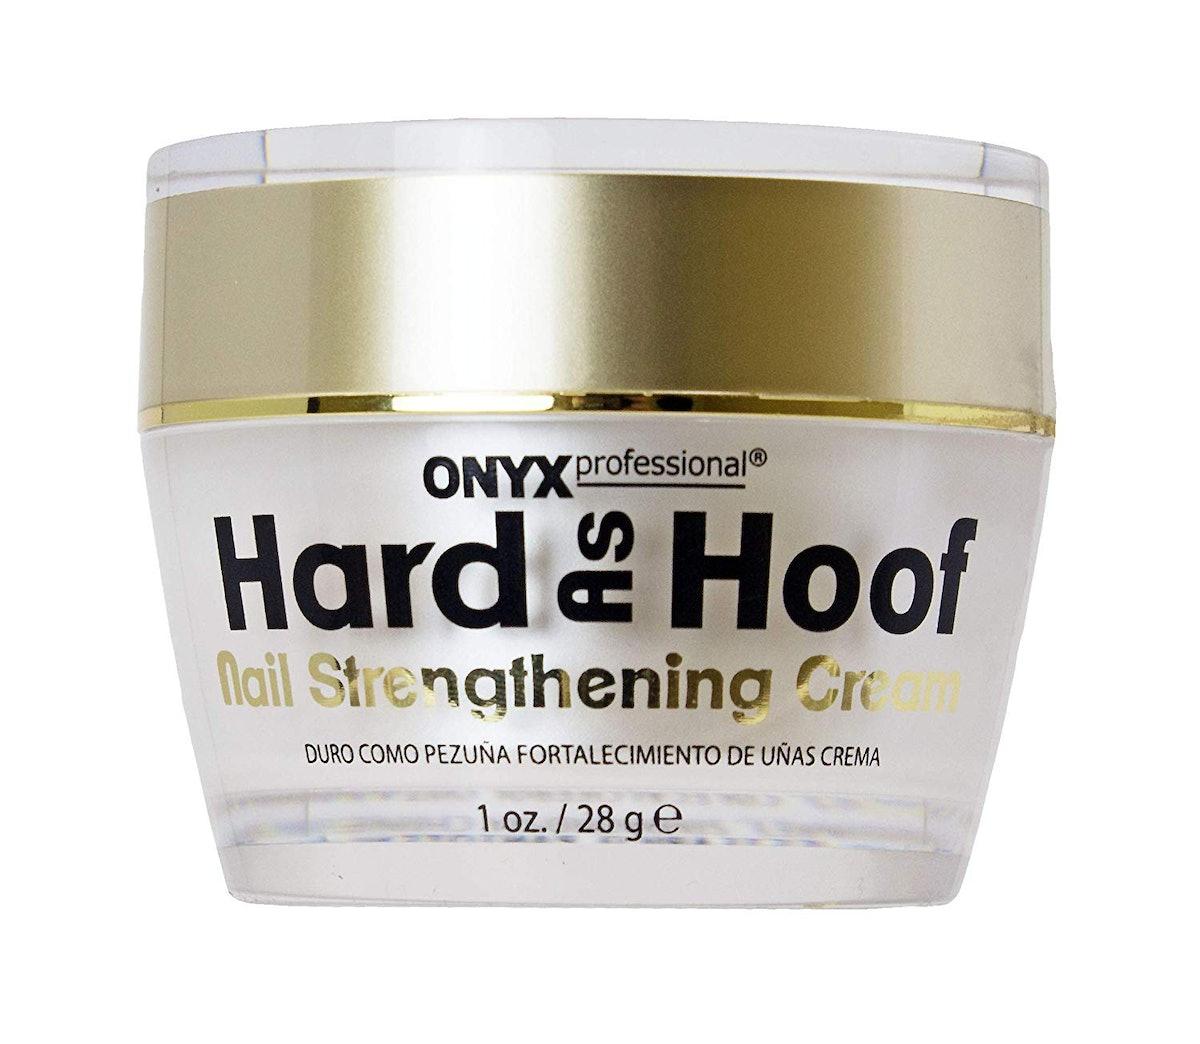 Onyx Professional Nail Strengthening Cream